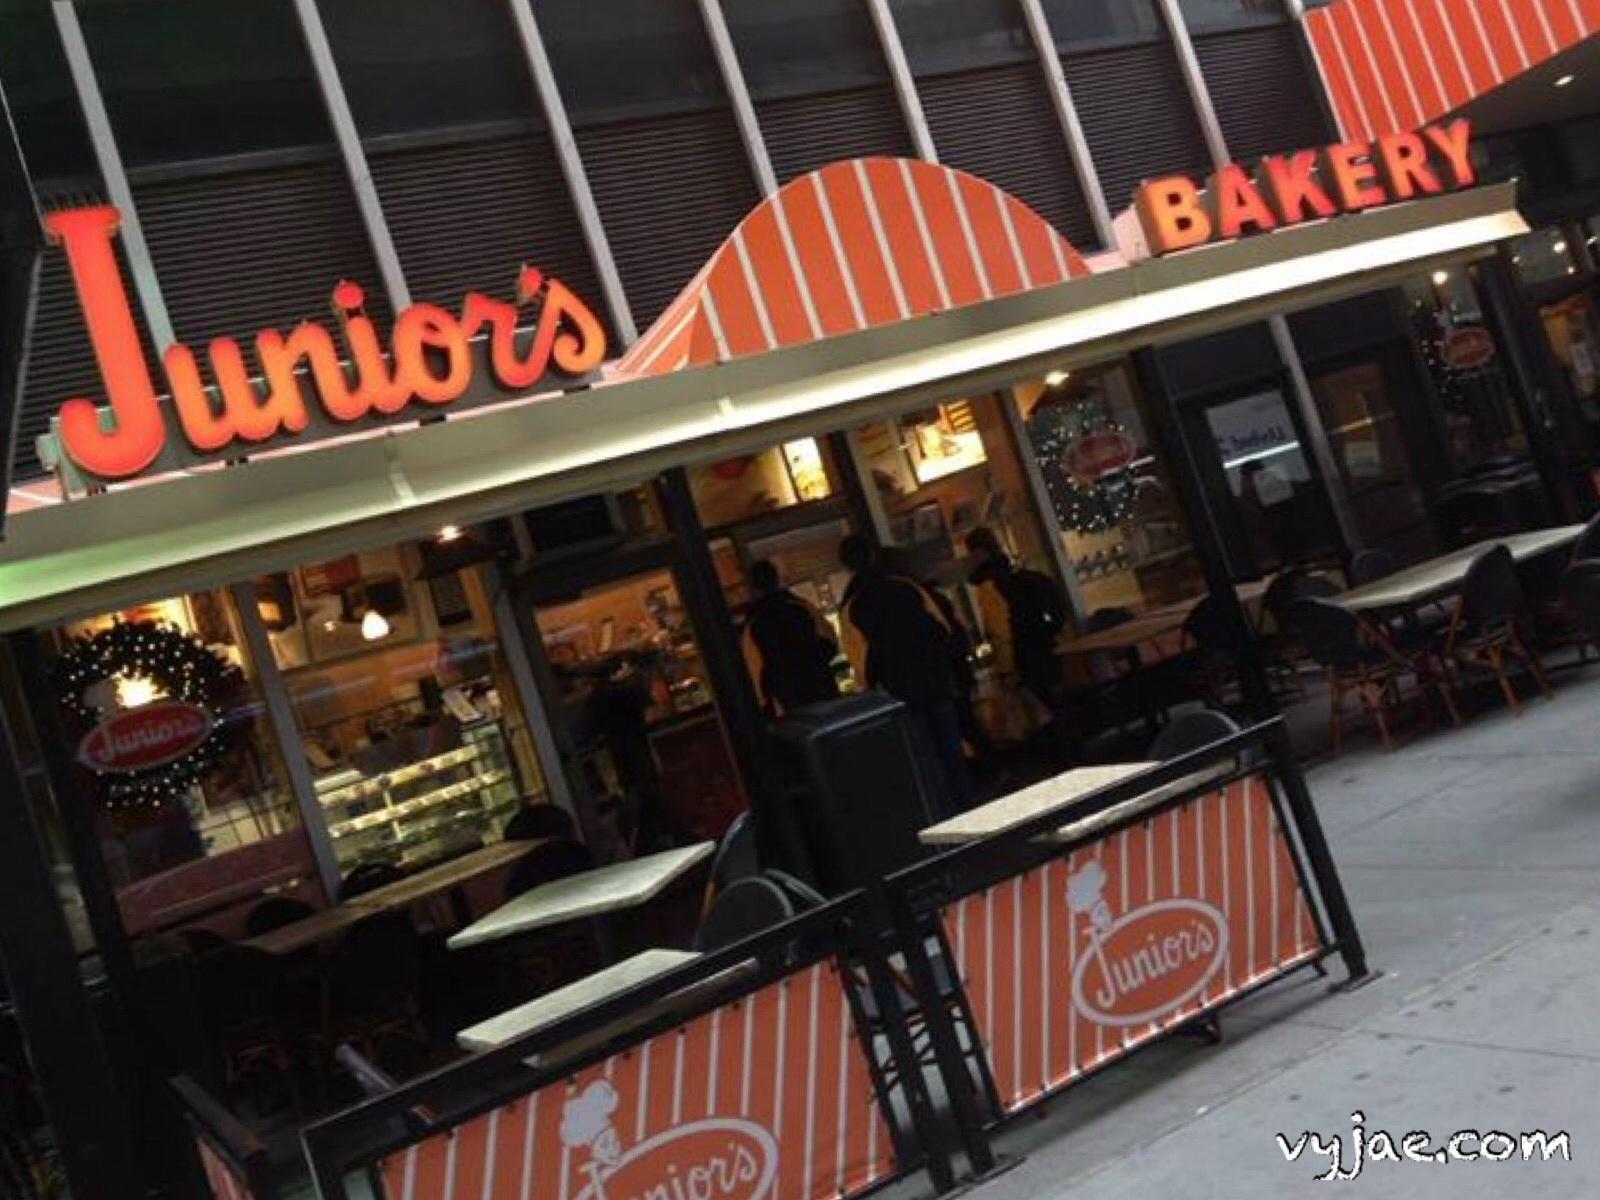 Junior's Bakery